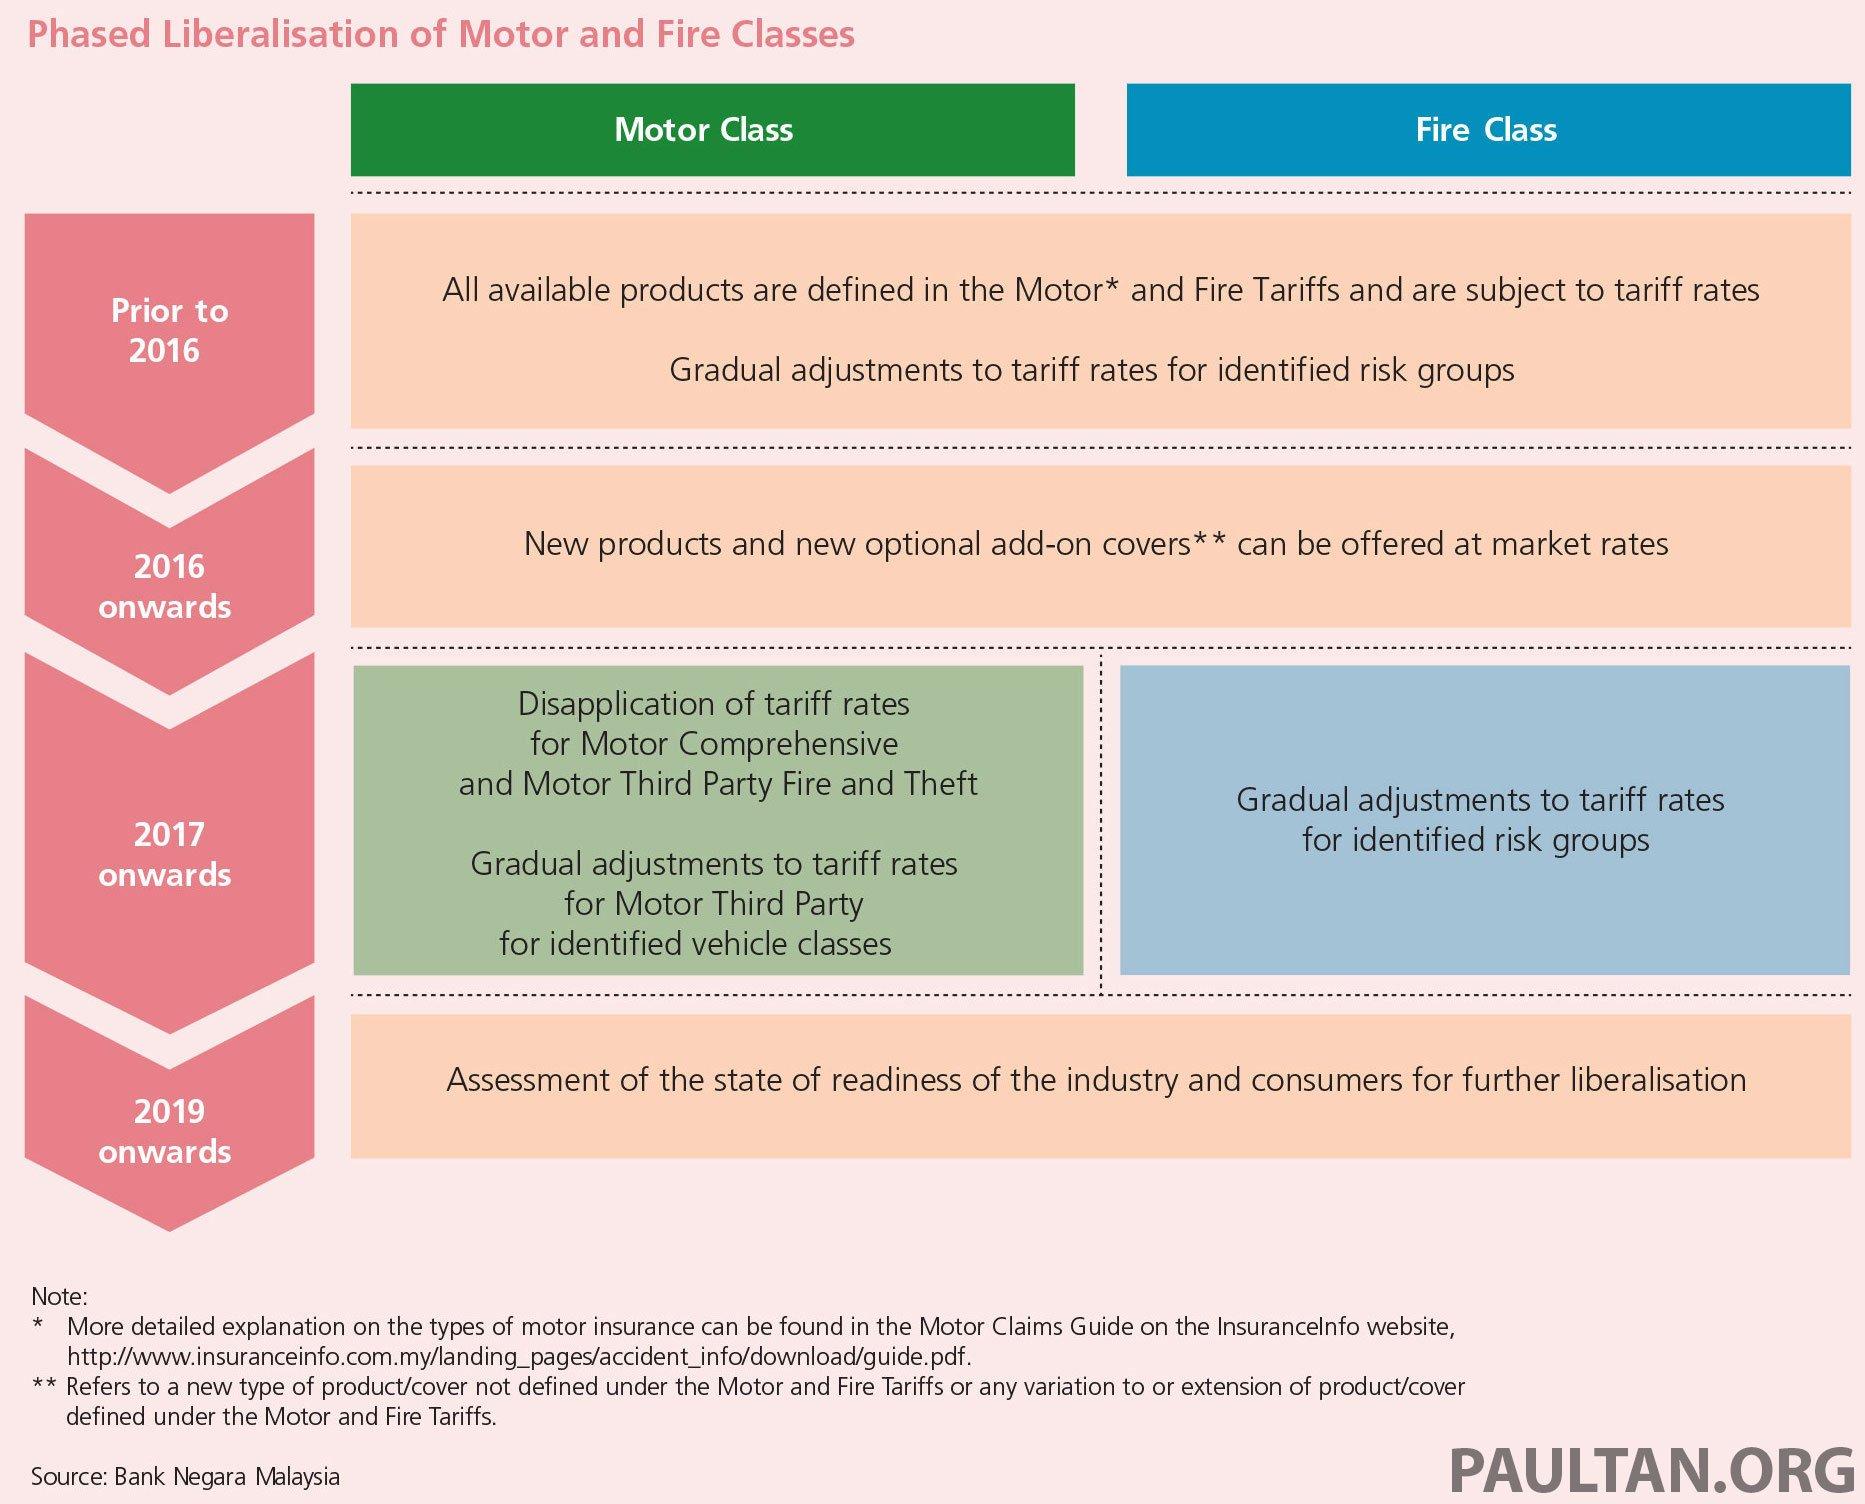 Motor Insurance Tariffs In Malaysia To Be Liberalised